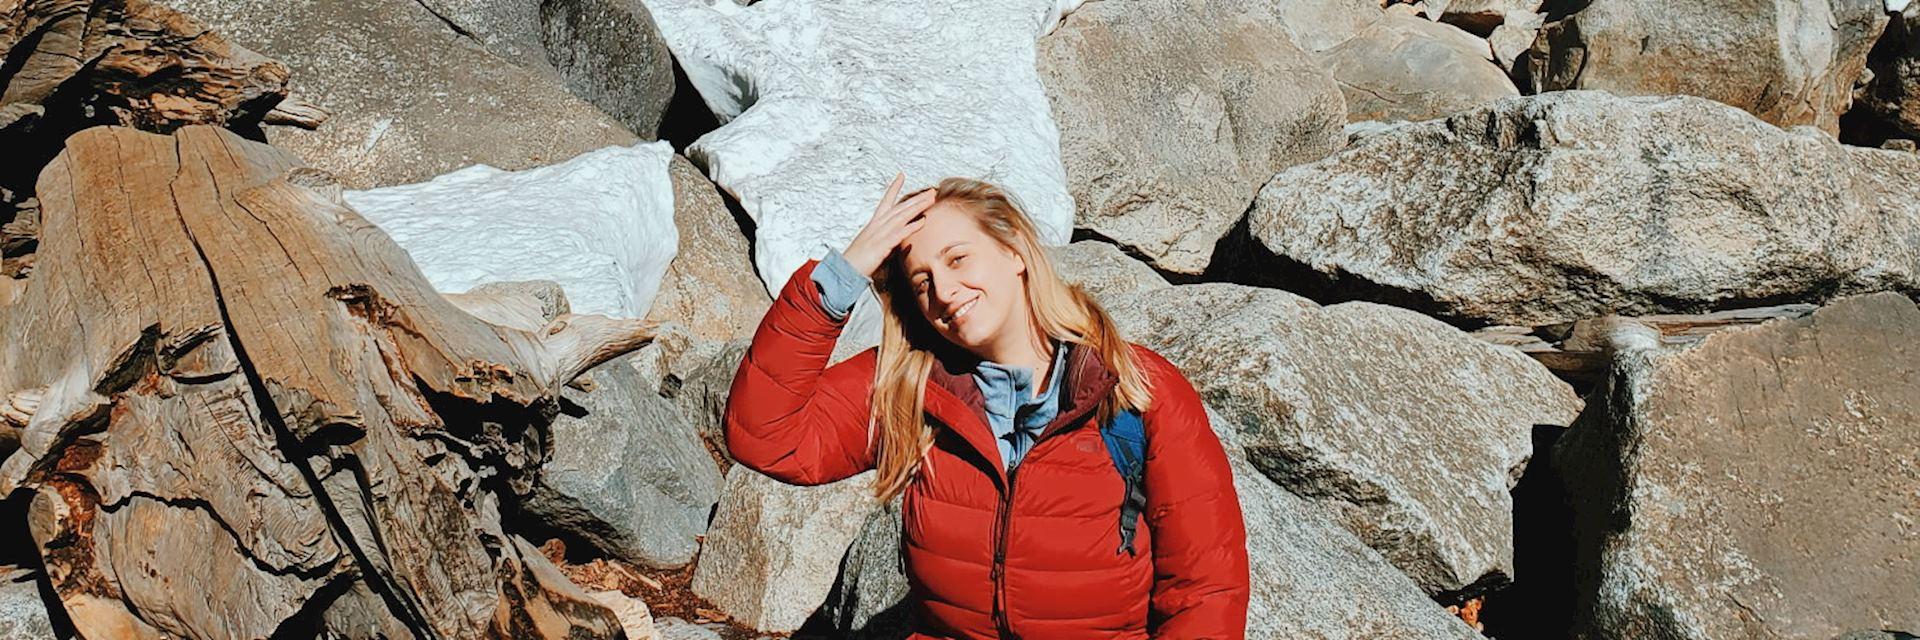 Hayley in Yosemite